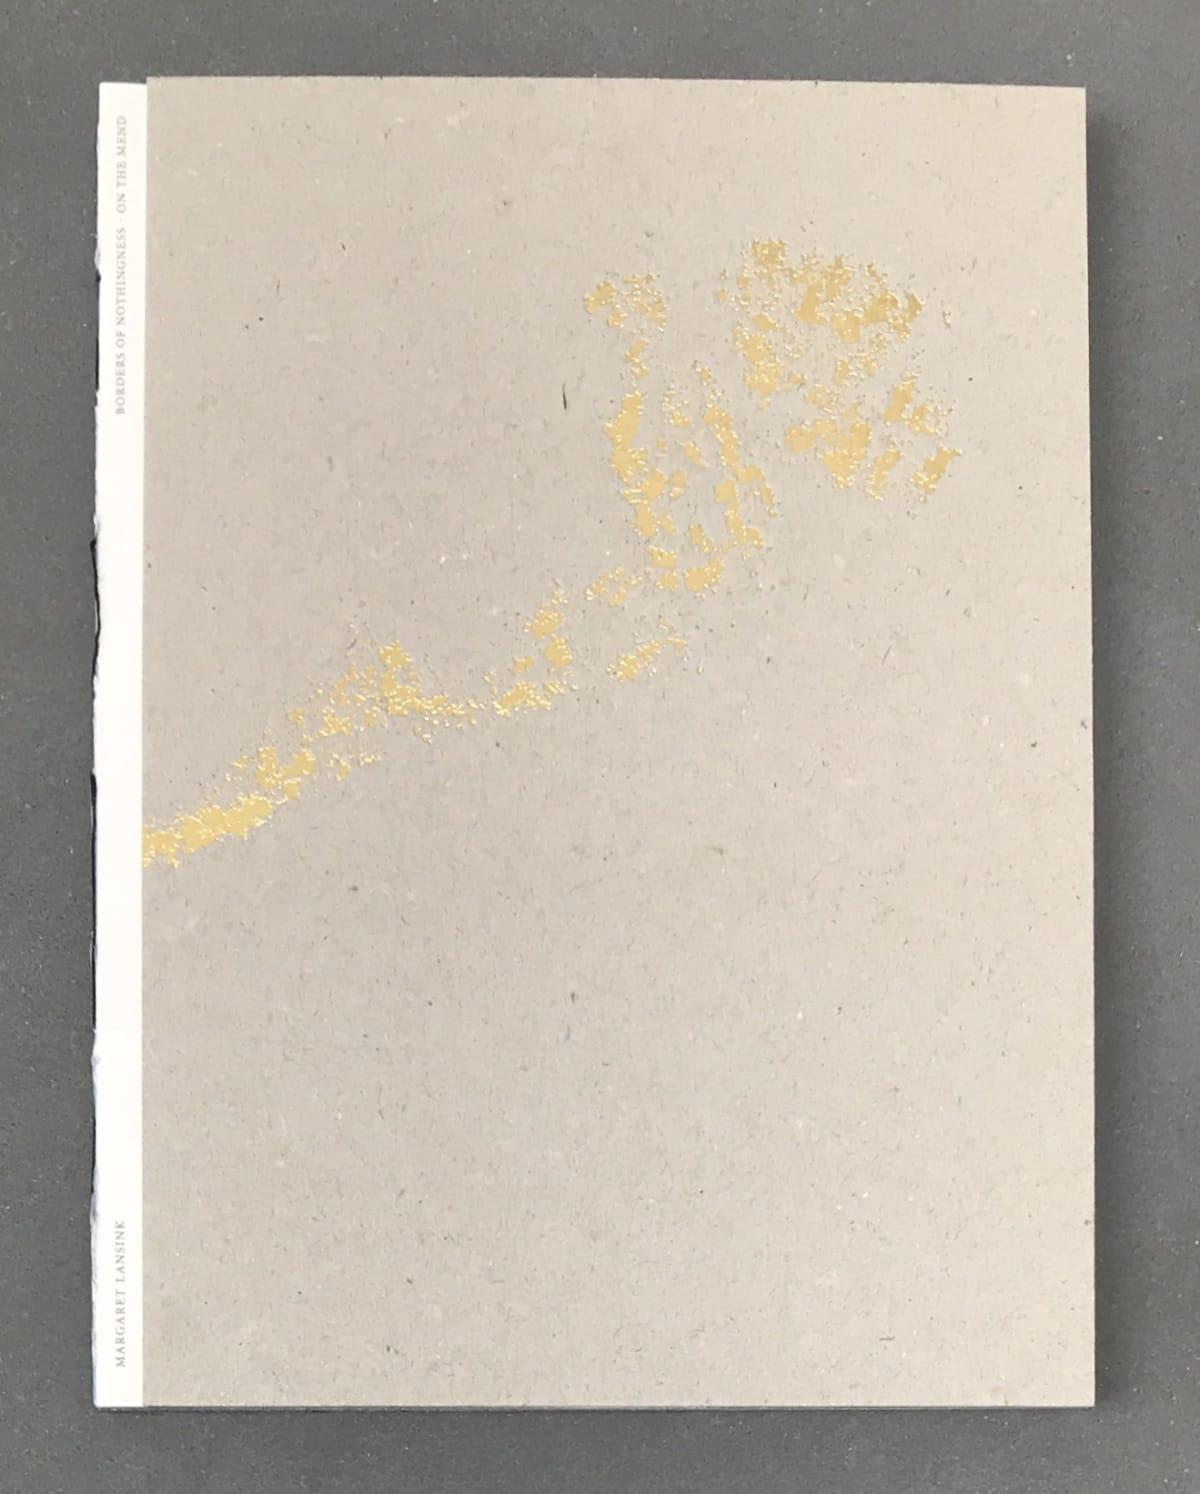 Borders of Nothingness - On the Mend - Margaret Lansink